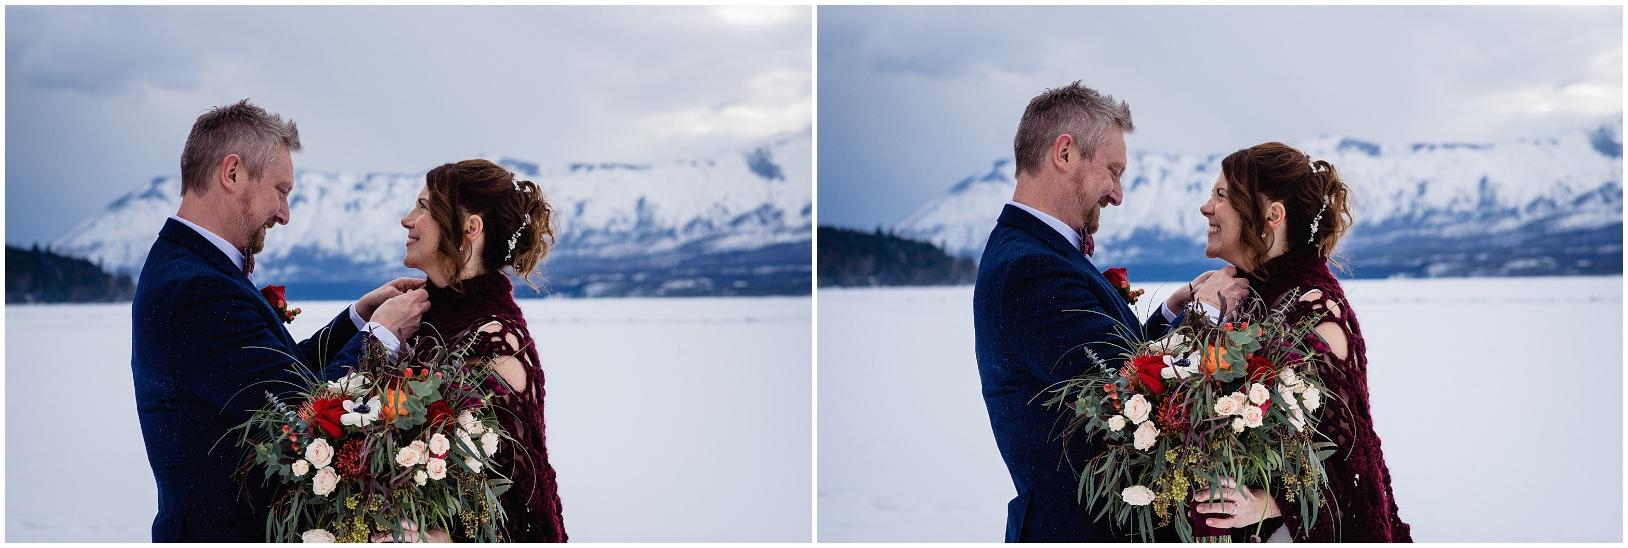 lindseyjanephotography_elopement057.jpg